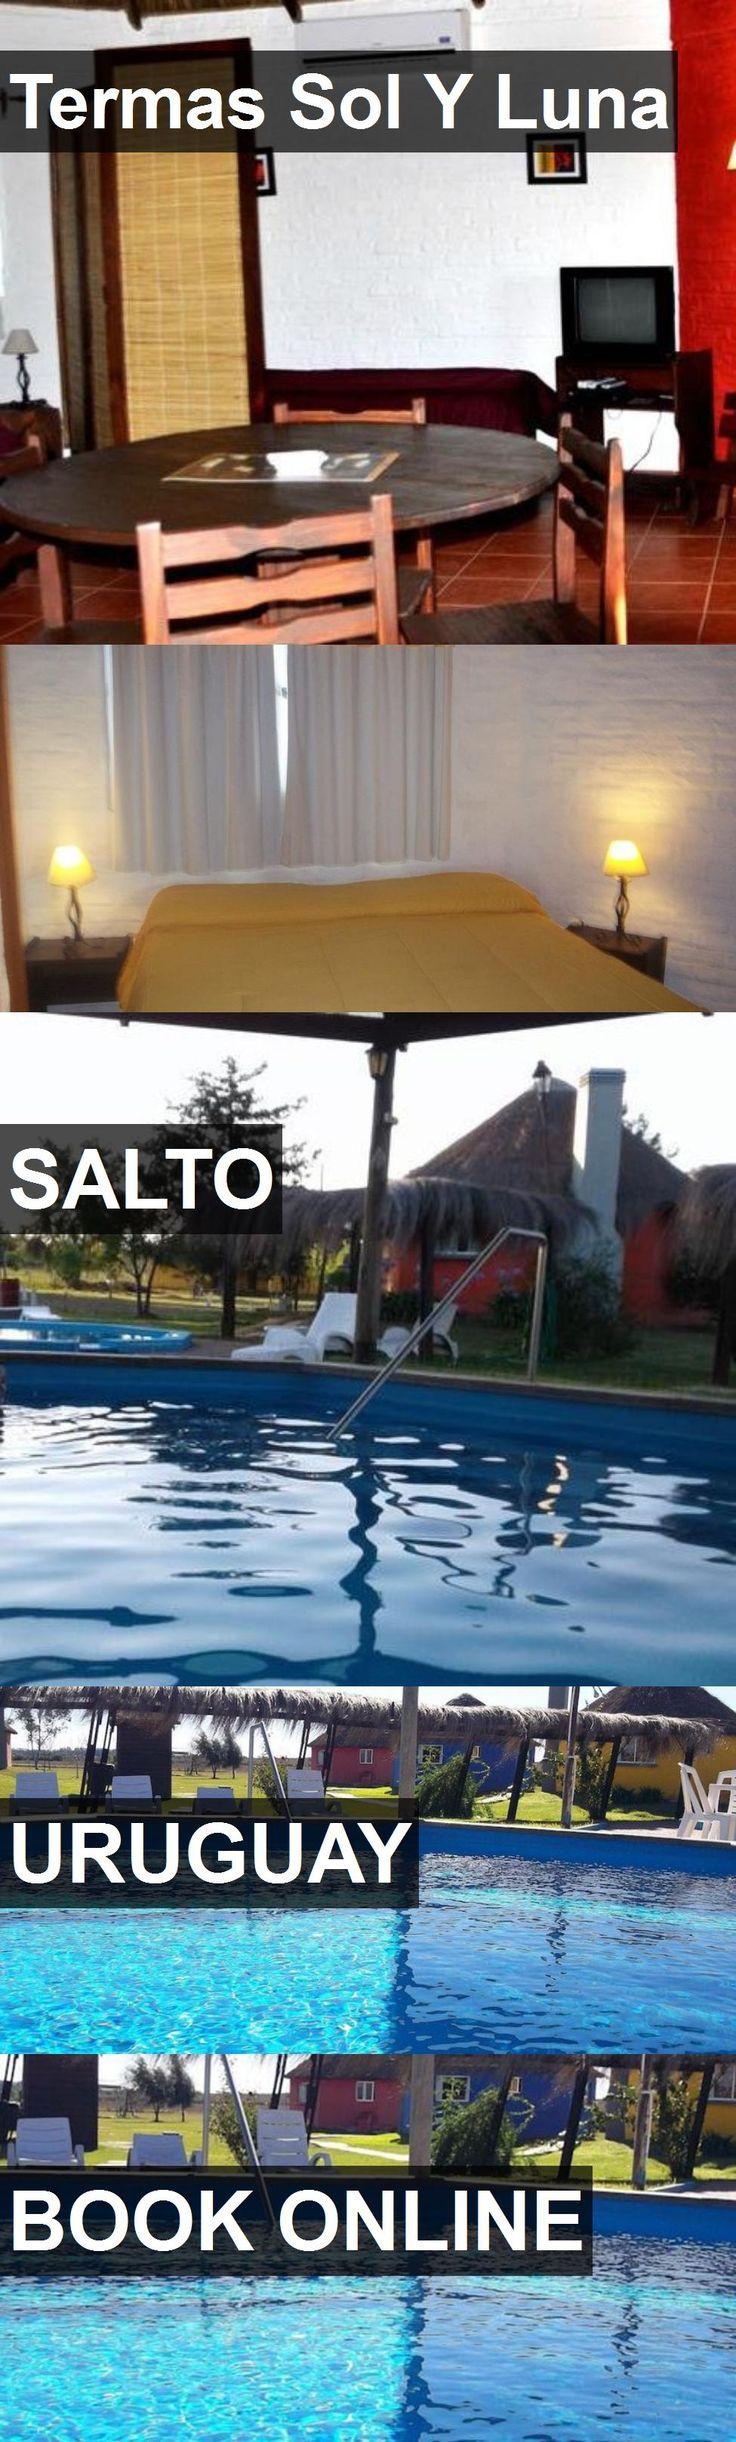 Hotel Termas Sol Y Luna in Salto, Uruguay. For more information, photos, reviews and best prices please follow the link. #Uruguay #Salto #travel #vacation #hotel